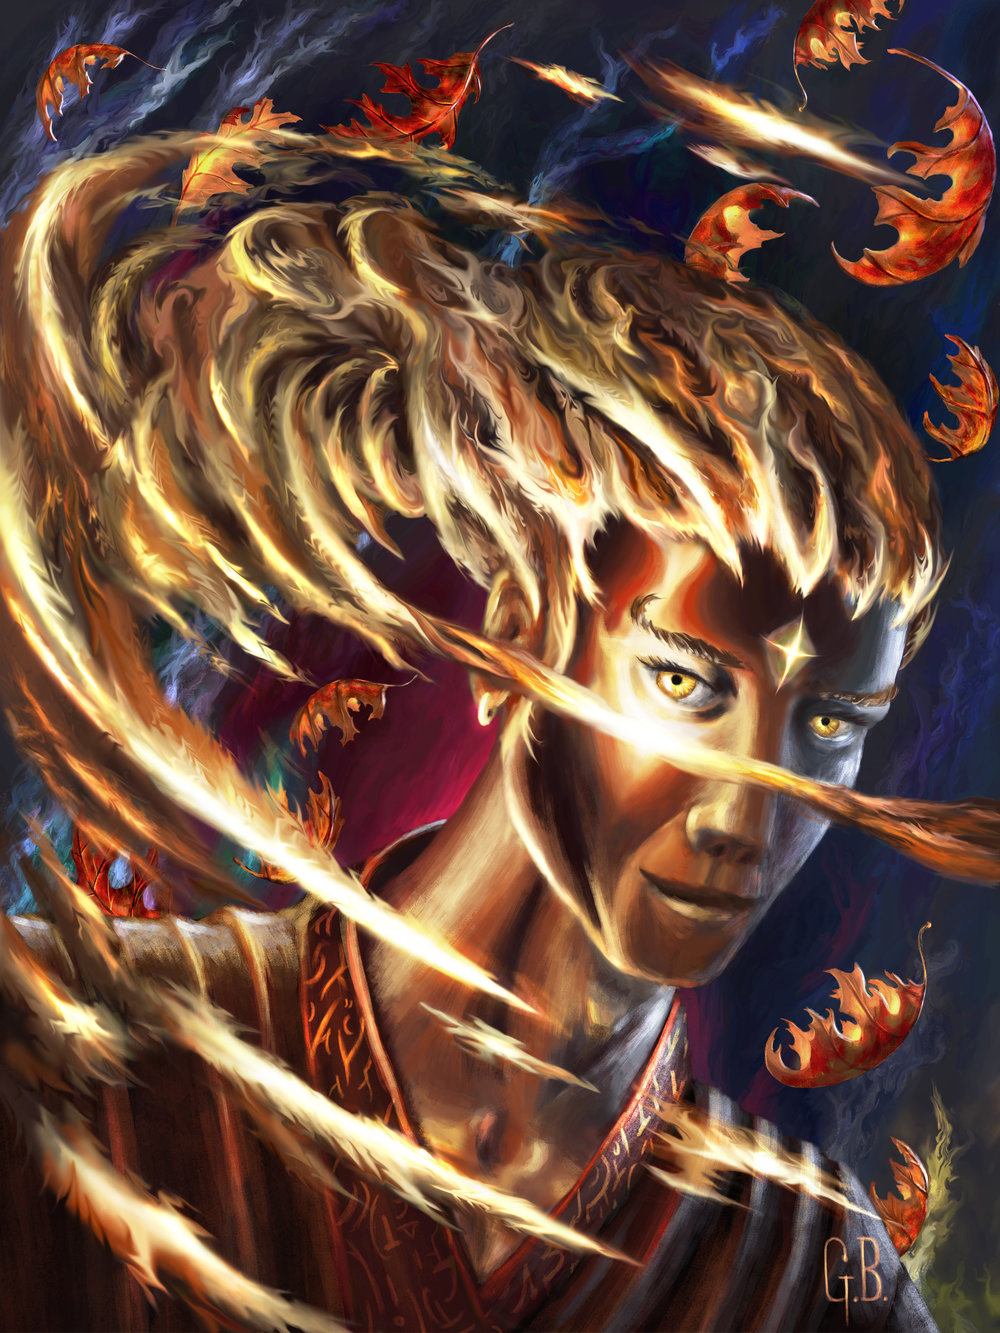 Copy of Gabriel's Fire